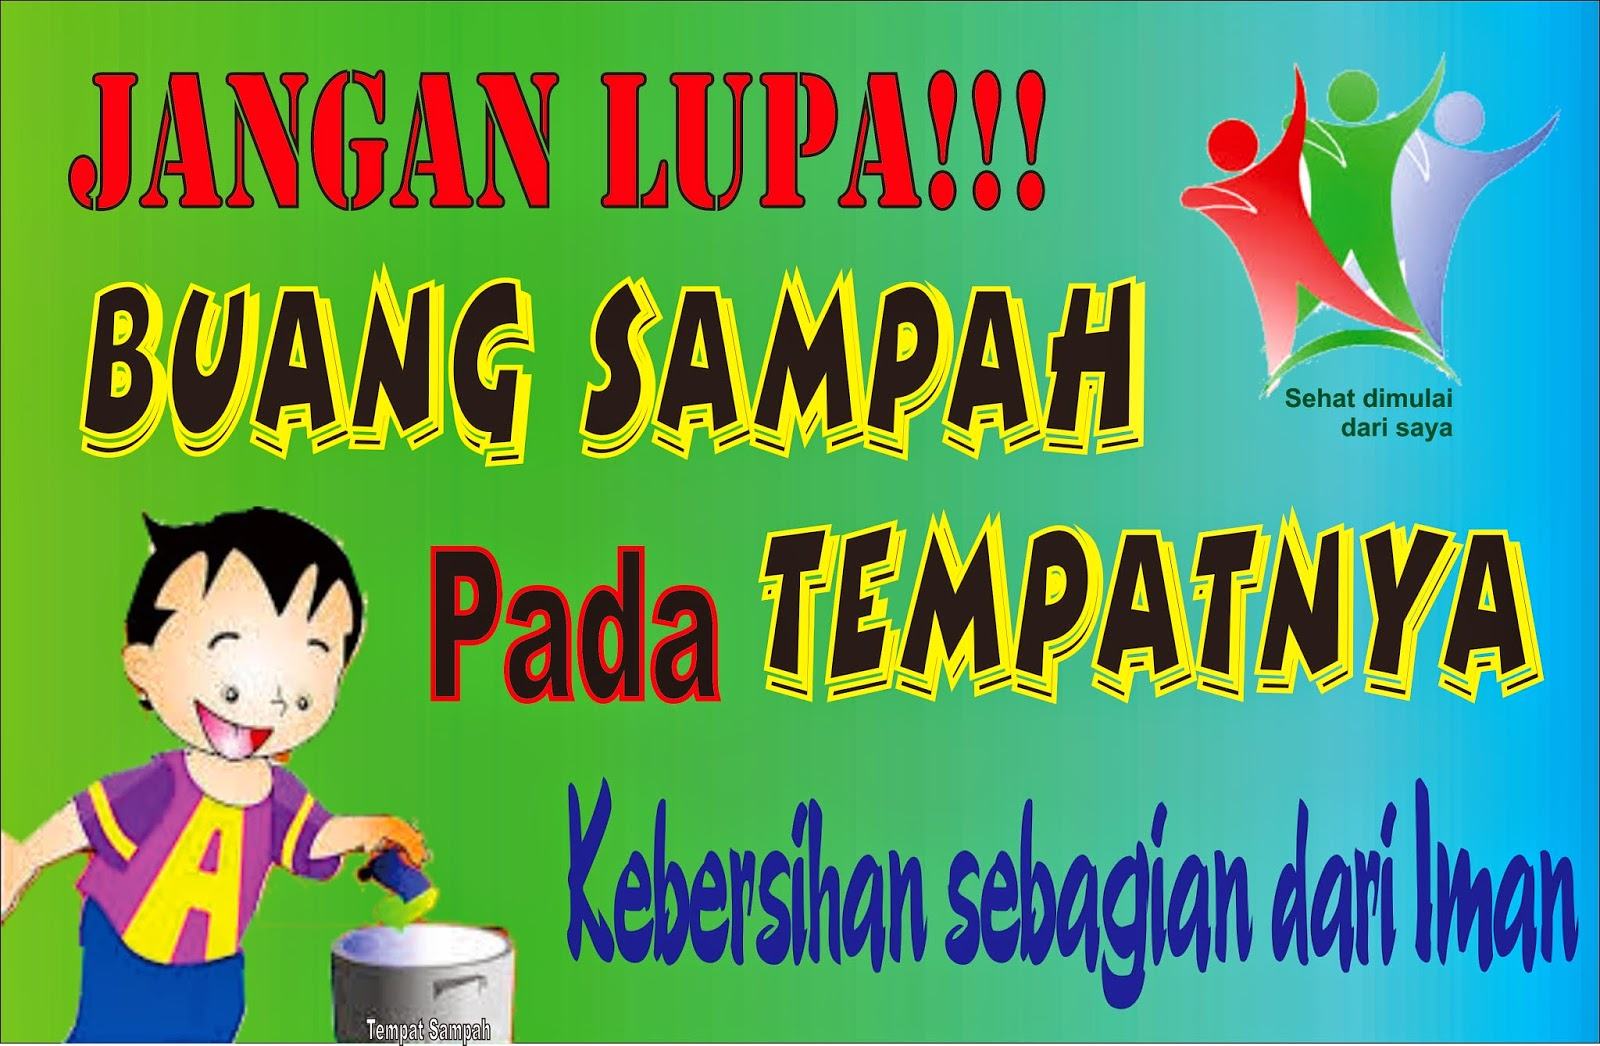 Sd Negeri 48 Tanjung Pandan Gambar Slogan Pendidikan